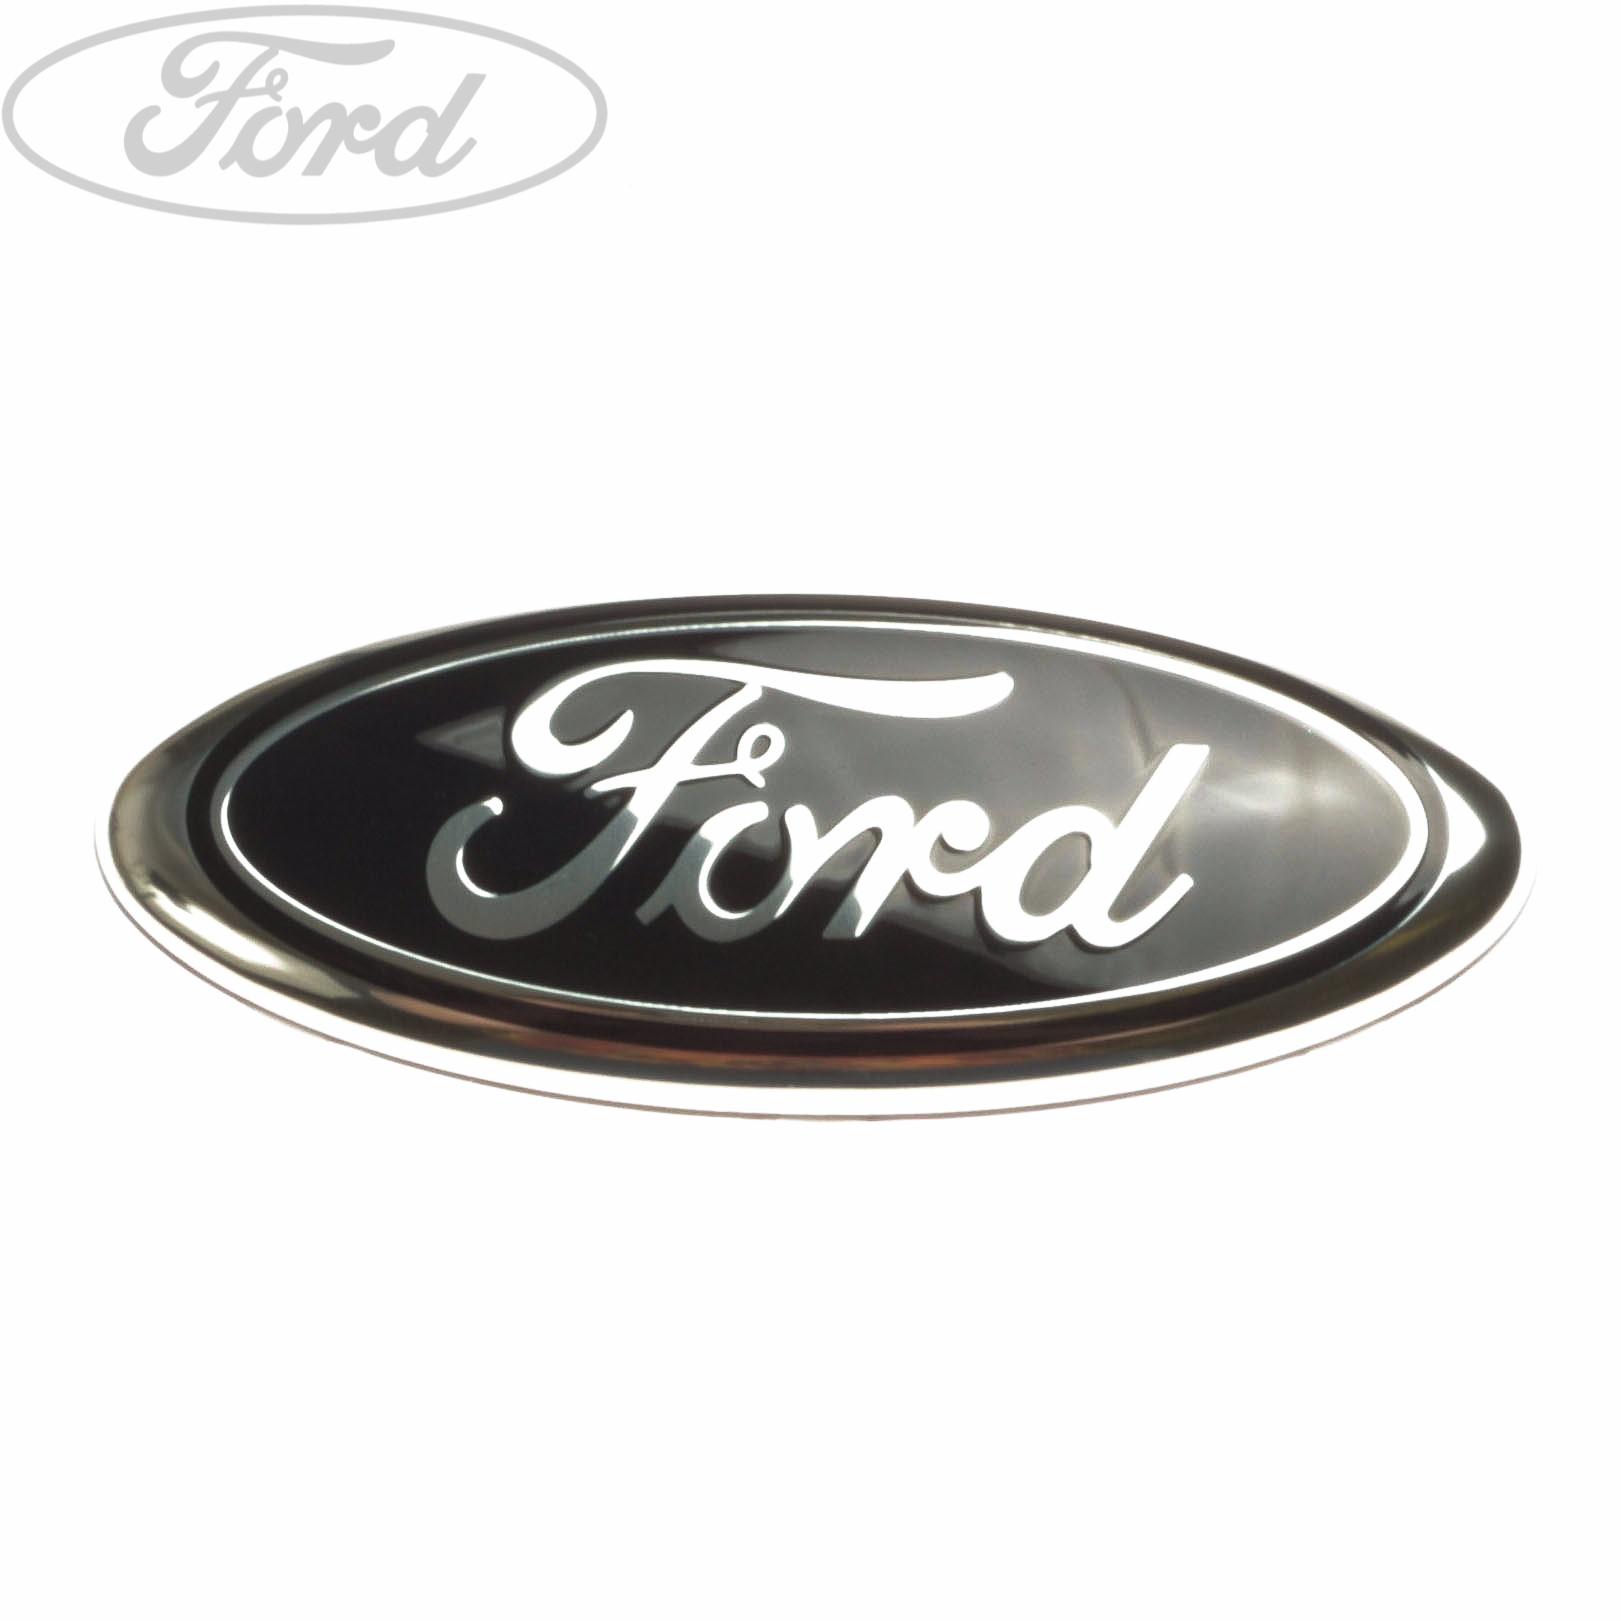 Genuine ford fiesta mk v radiator grille emblem badge for Telephone number for ford motor company